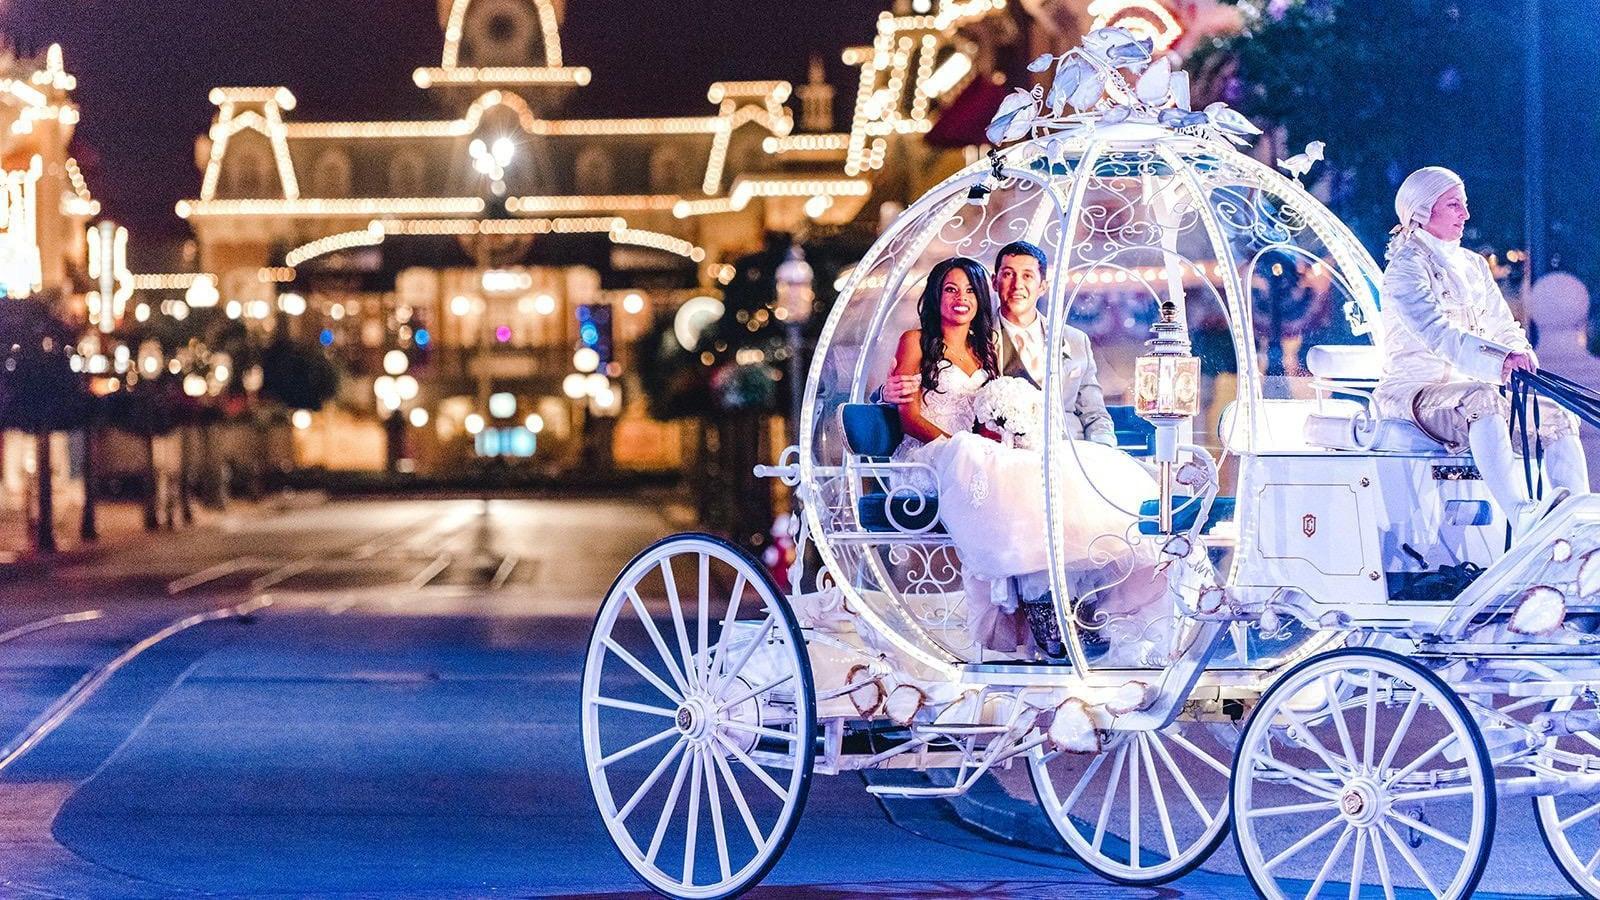 Disney's Fairy Tale Weddings - Season 2 Episode 2 : Alaska to Marry Me